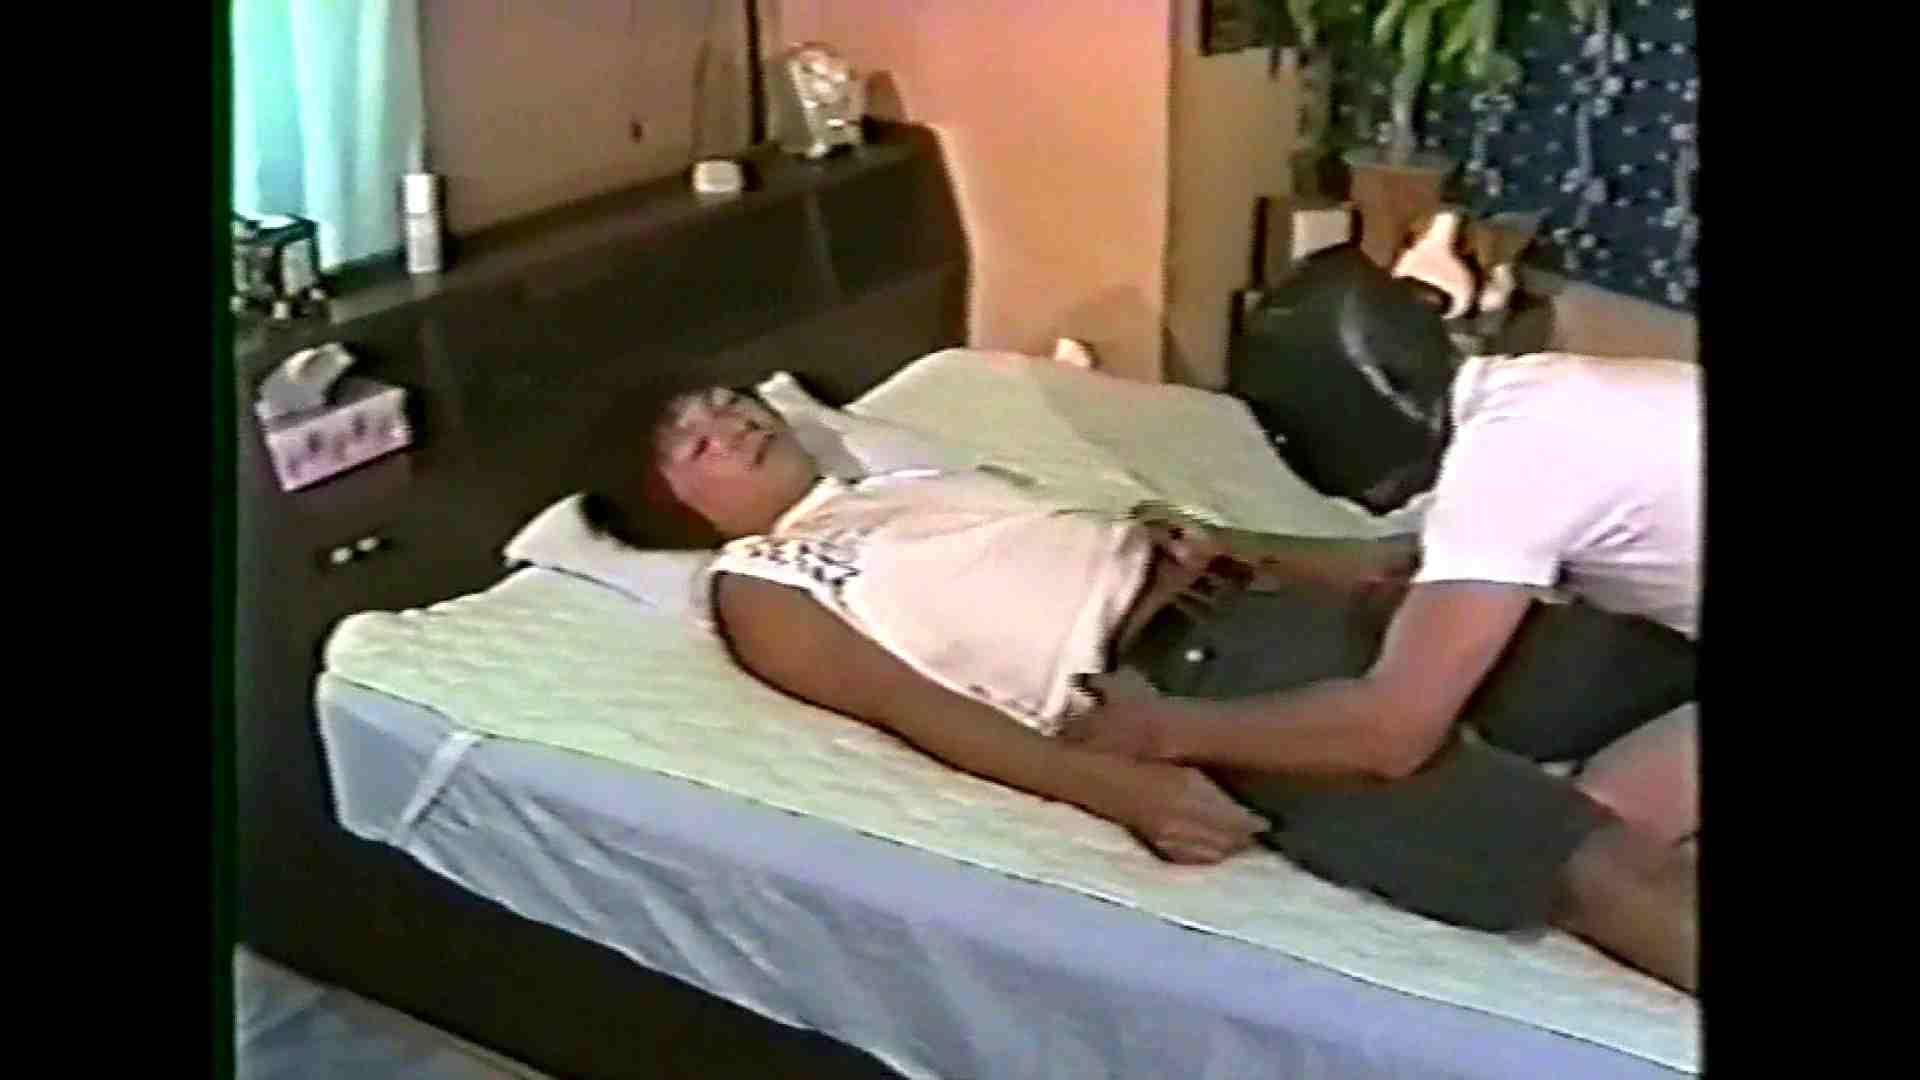 GAYBOY宏のオカズ倉庫Vol.3-1 GAY ゲイセックス画像 103画像 71